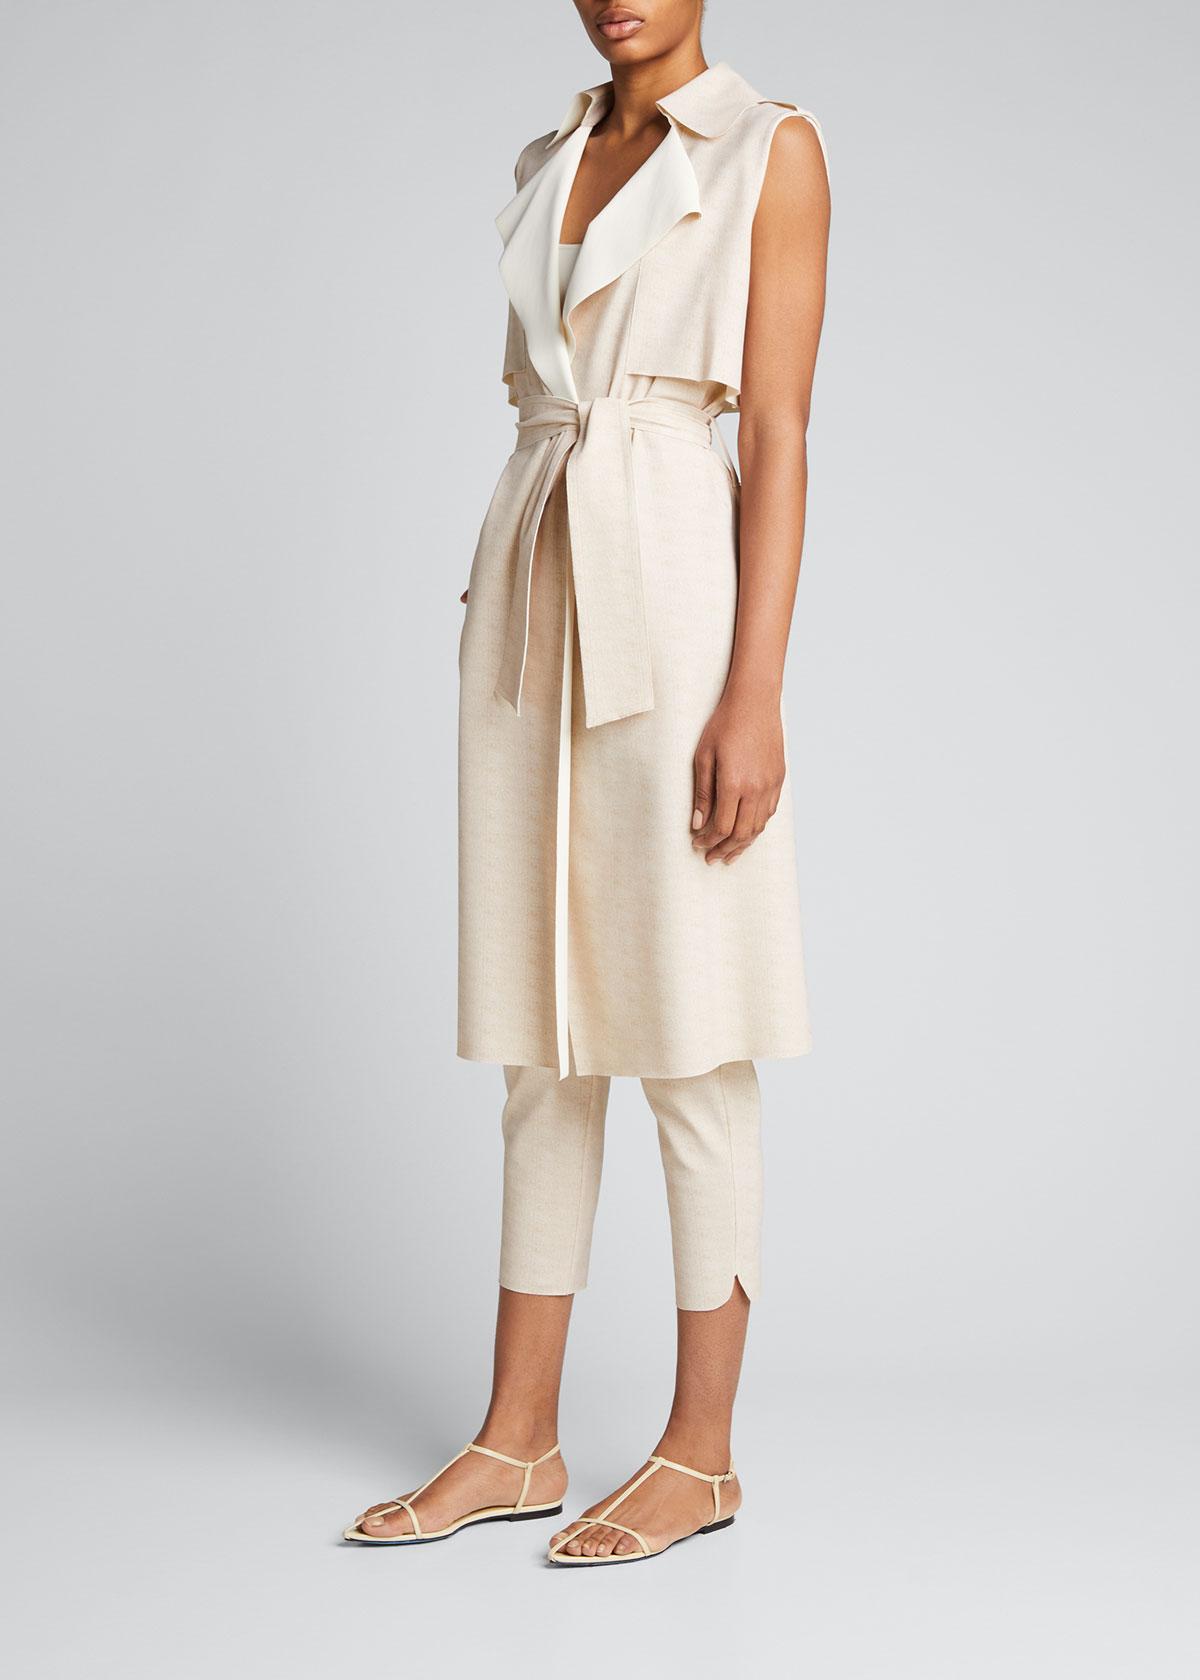 Chiara Boni La Petite Robe CALLISTO JERSEY PANTS